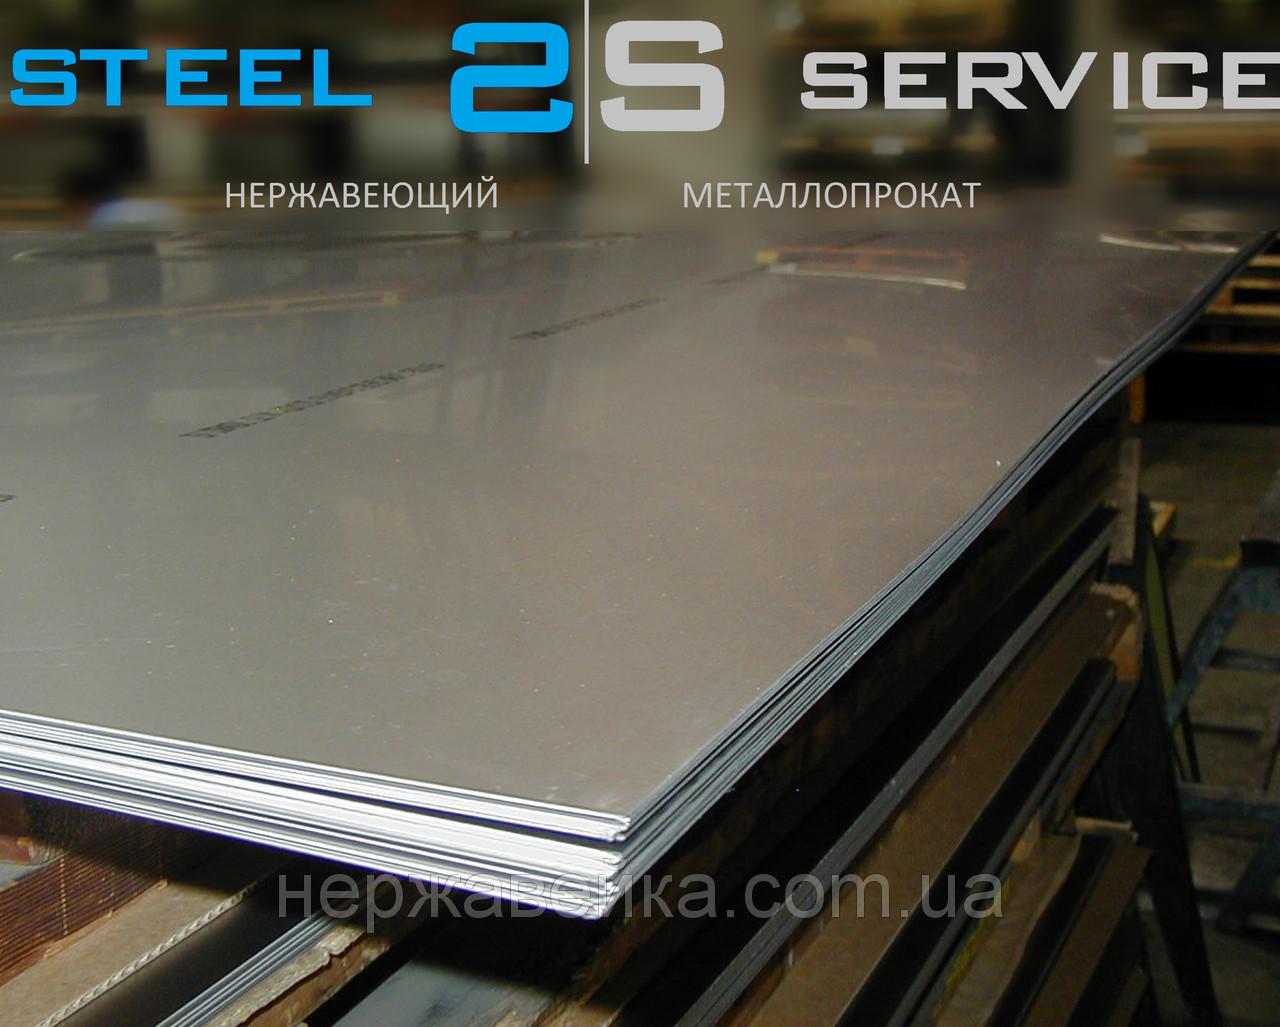 Нержавеющий лист 30х1500х3000мм  AISI 316L(03Х17Н14М3) F1 - горячекатанный,  кислотостойкий